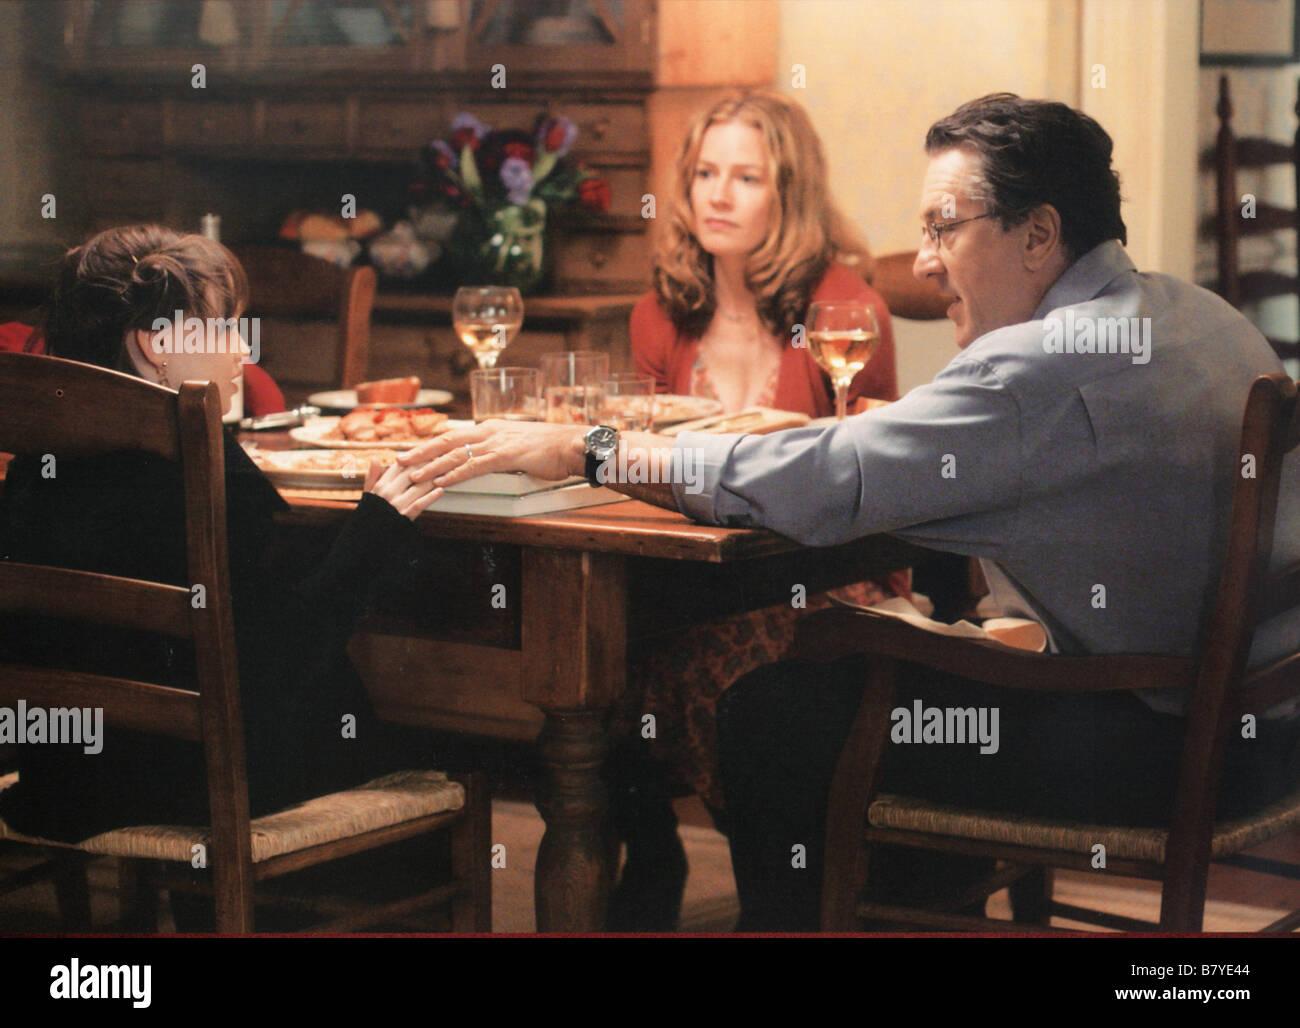 Hide And Seek Year 2005 Usa Dakota Fanning Robert De Niro